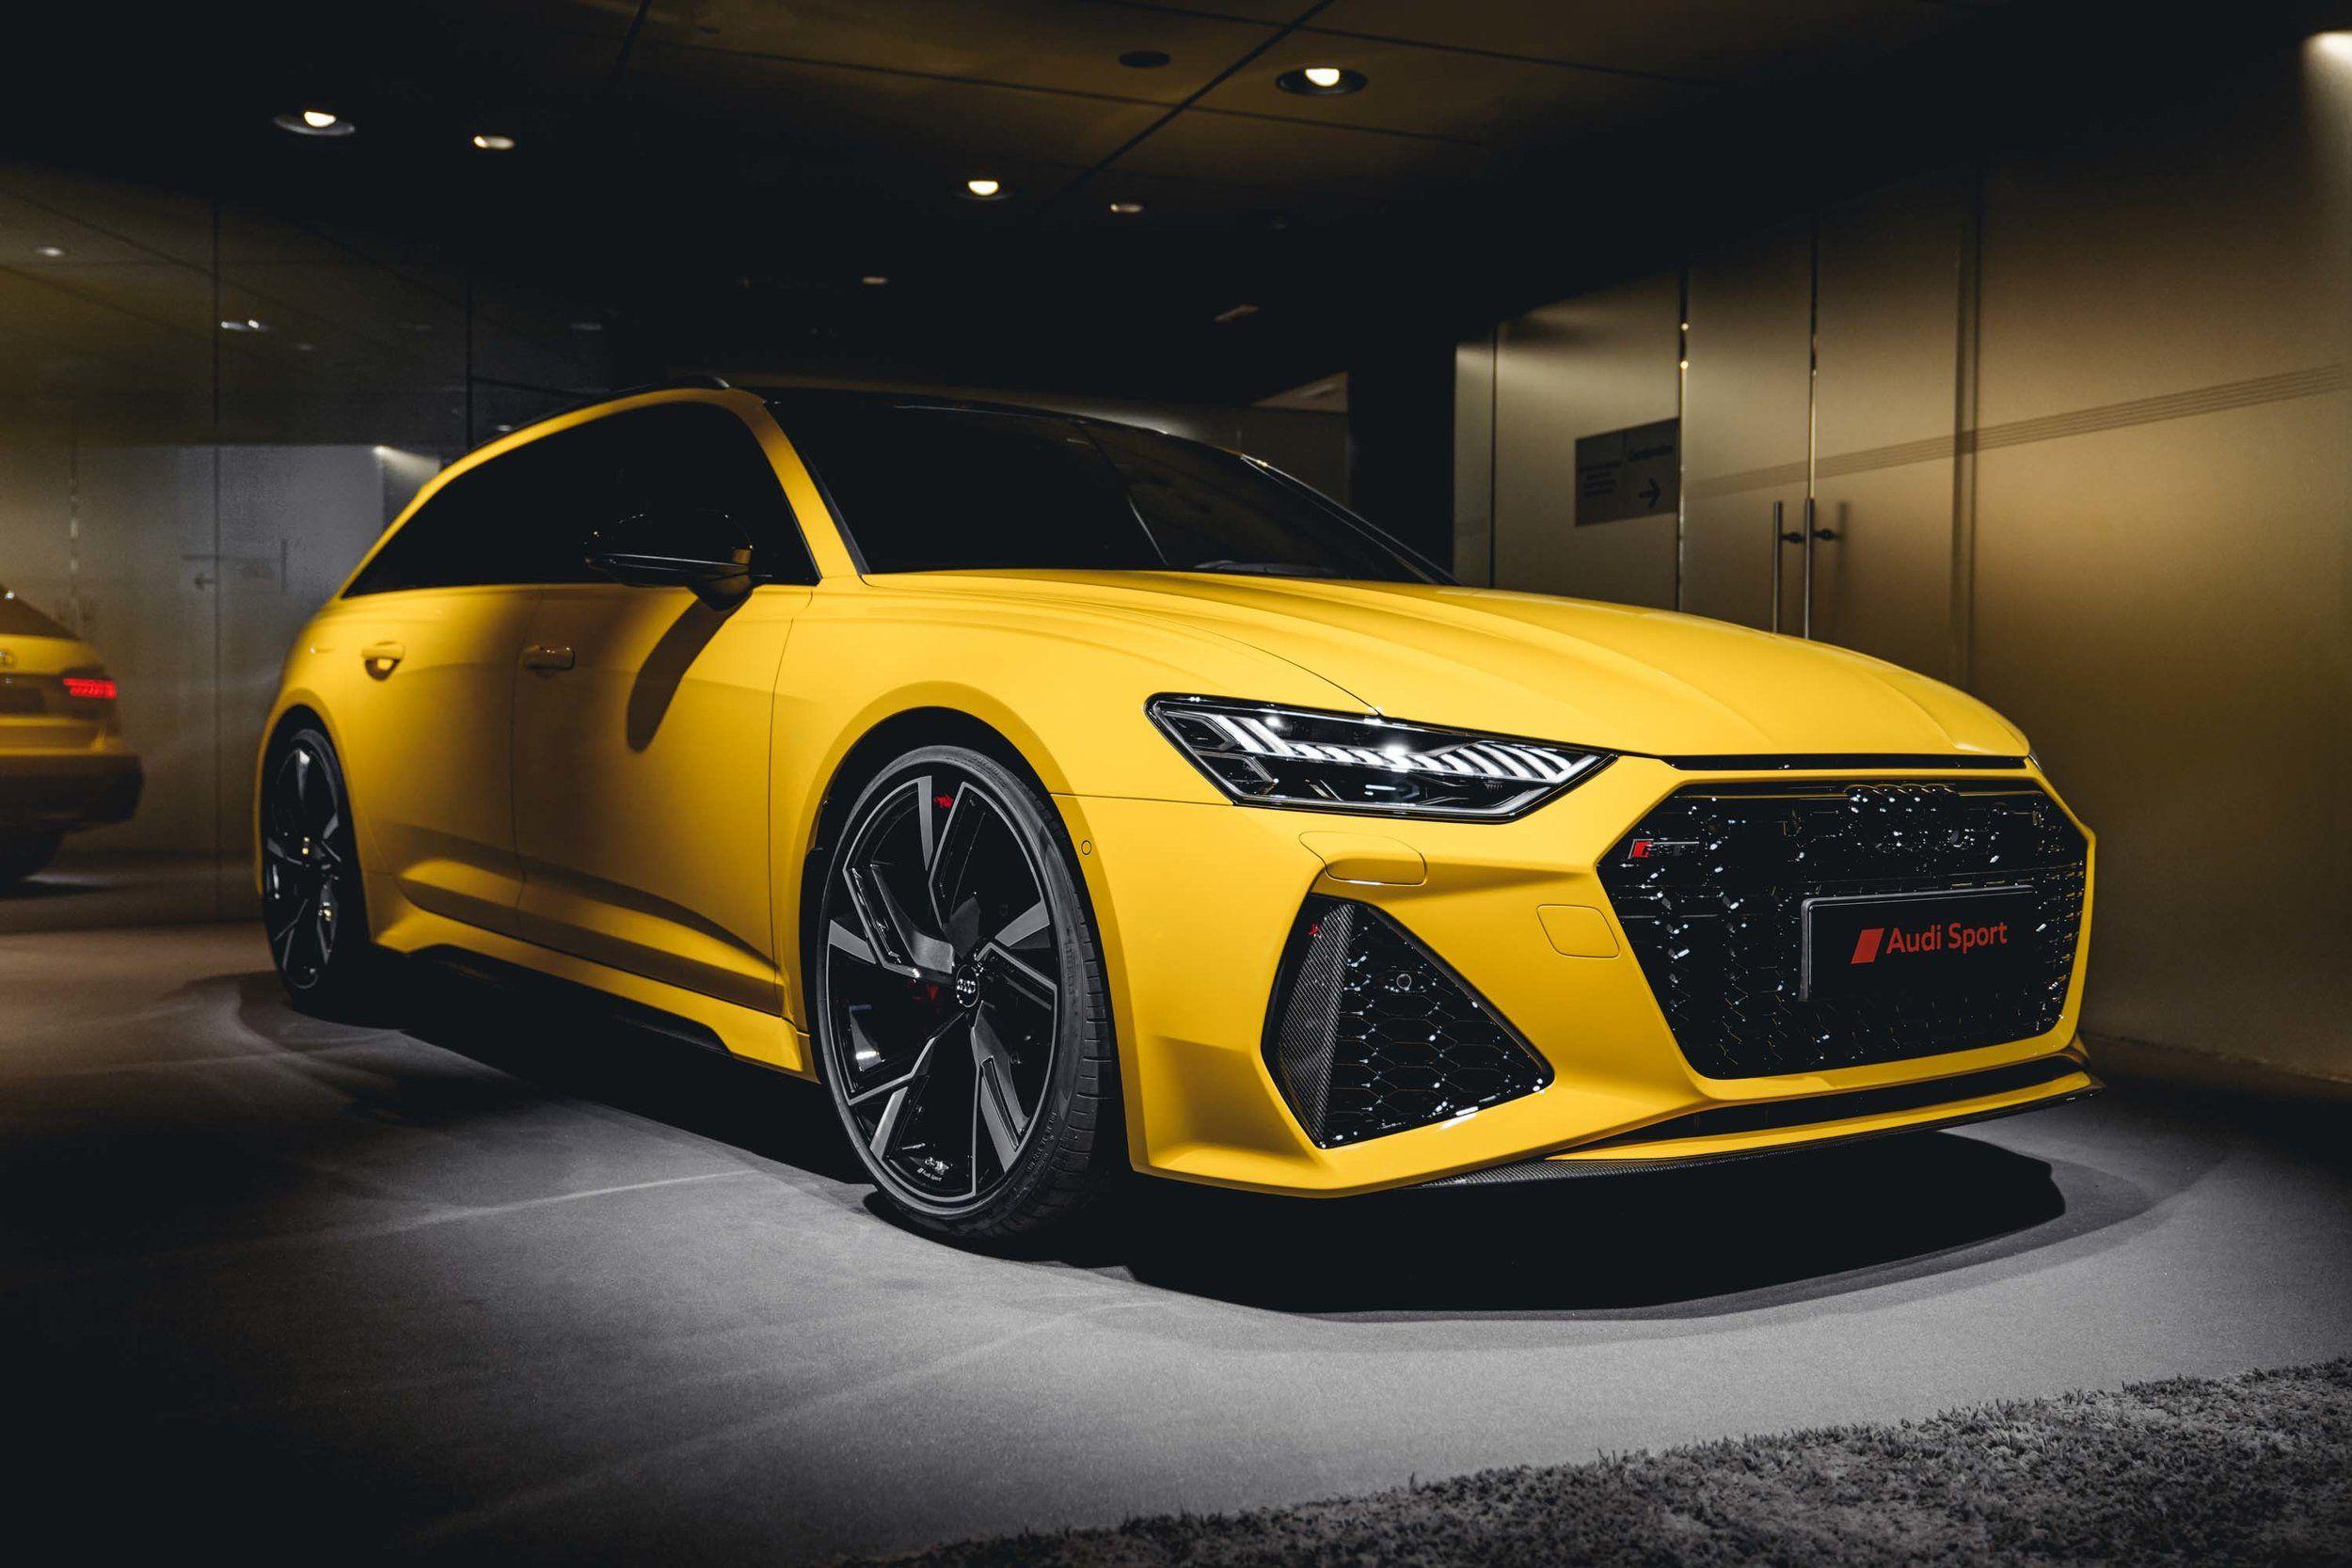 Audi Rs6 Avant C8 2020 Max Otto In 2020 Audi Rs6 Audi Audi Sport